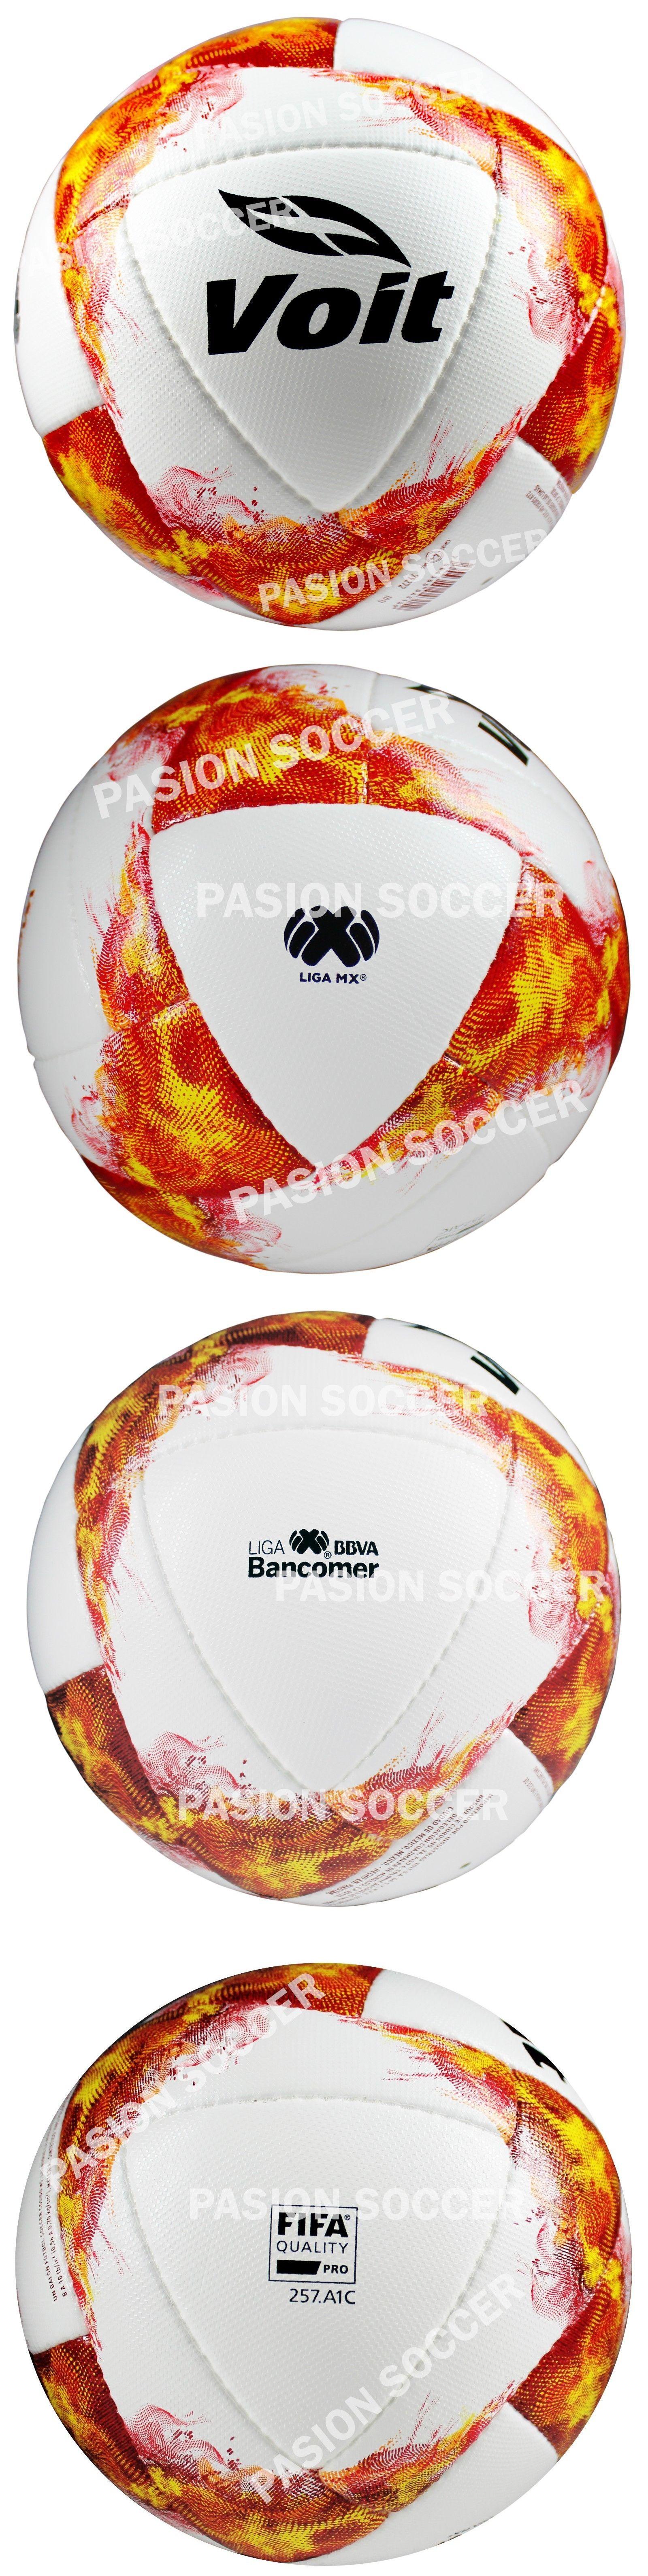 Balls 20863  Official Match Fifa Voit Soccer Ball Nova Liga Bancomer Mx  Apertura 2018 -  BUY IT NOW ONLY   79.99 on eBay! e90372ad63521